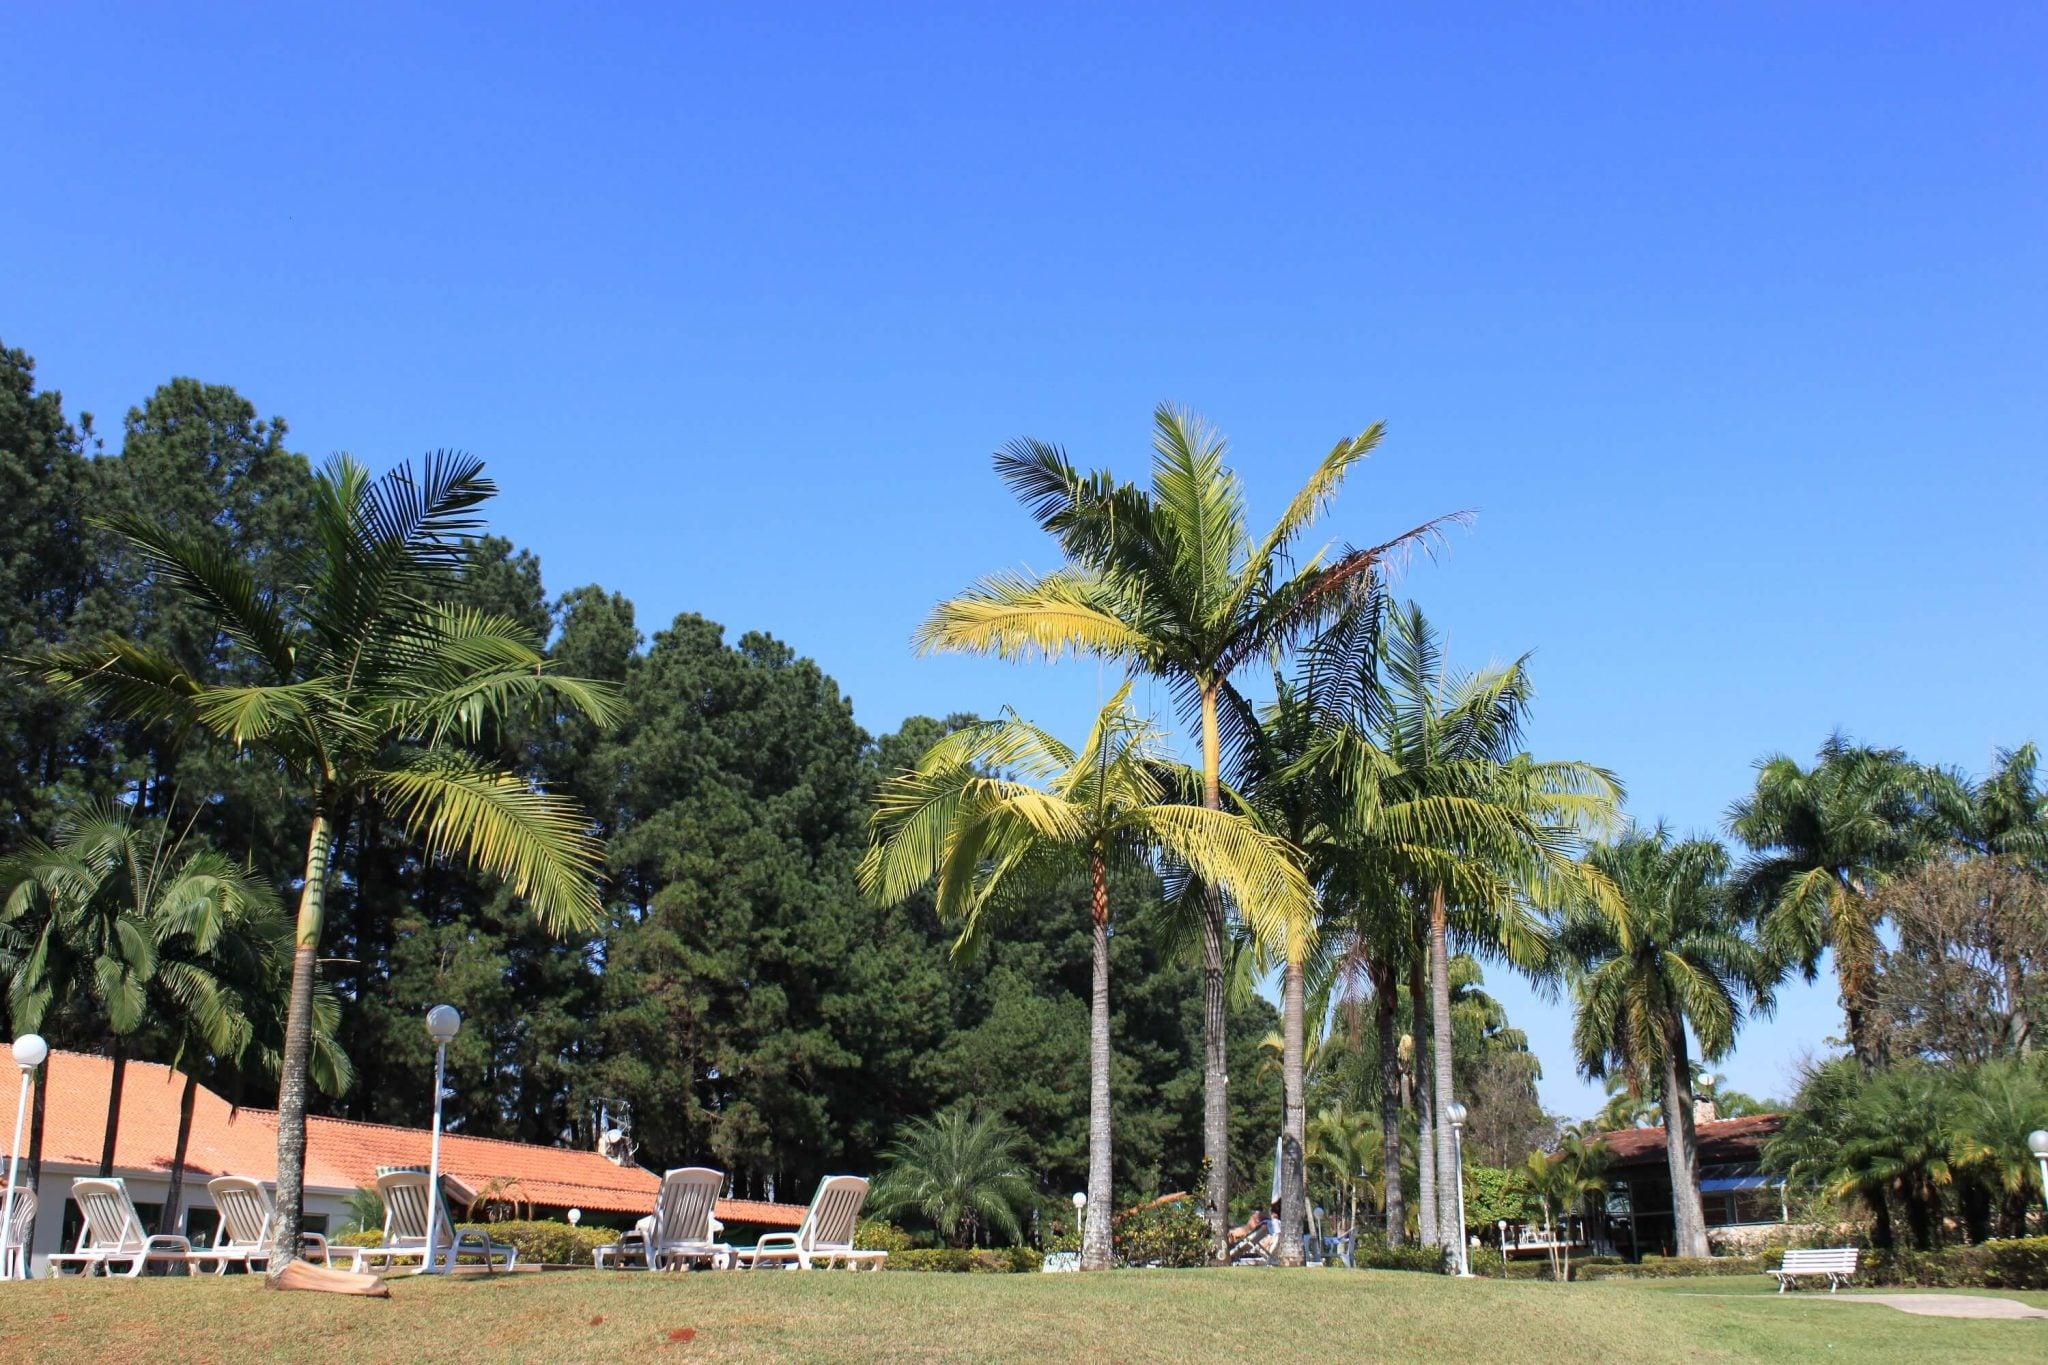 SPA Sorocaba - Piscinas - Area de Lazer - Area Aberta